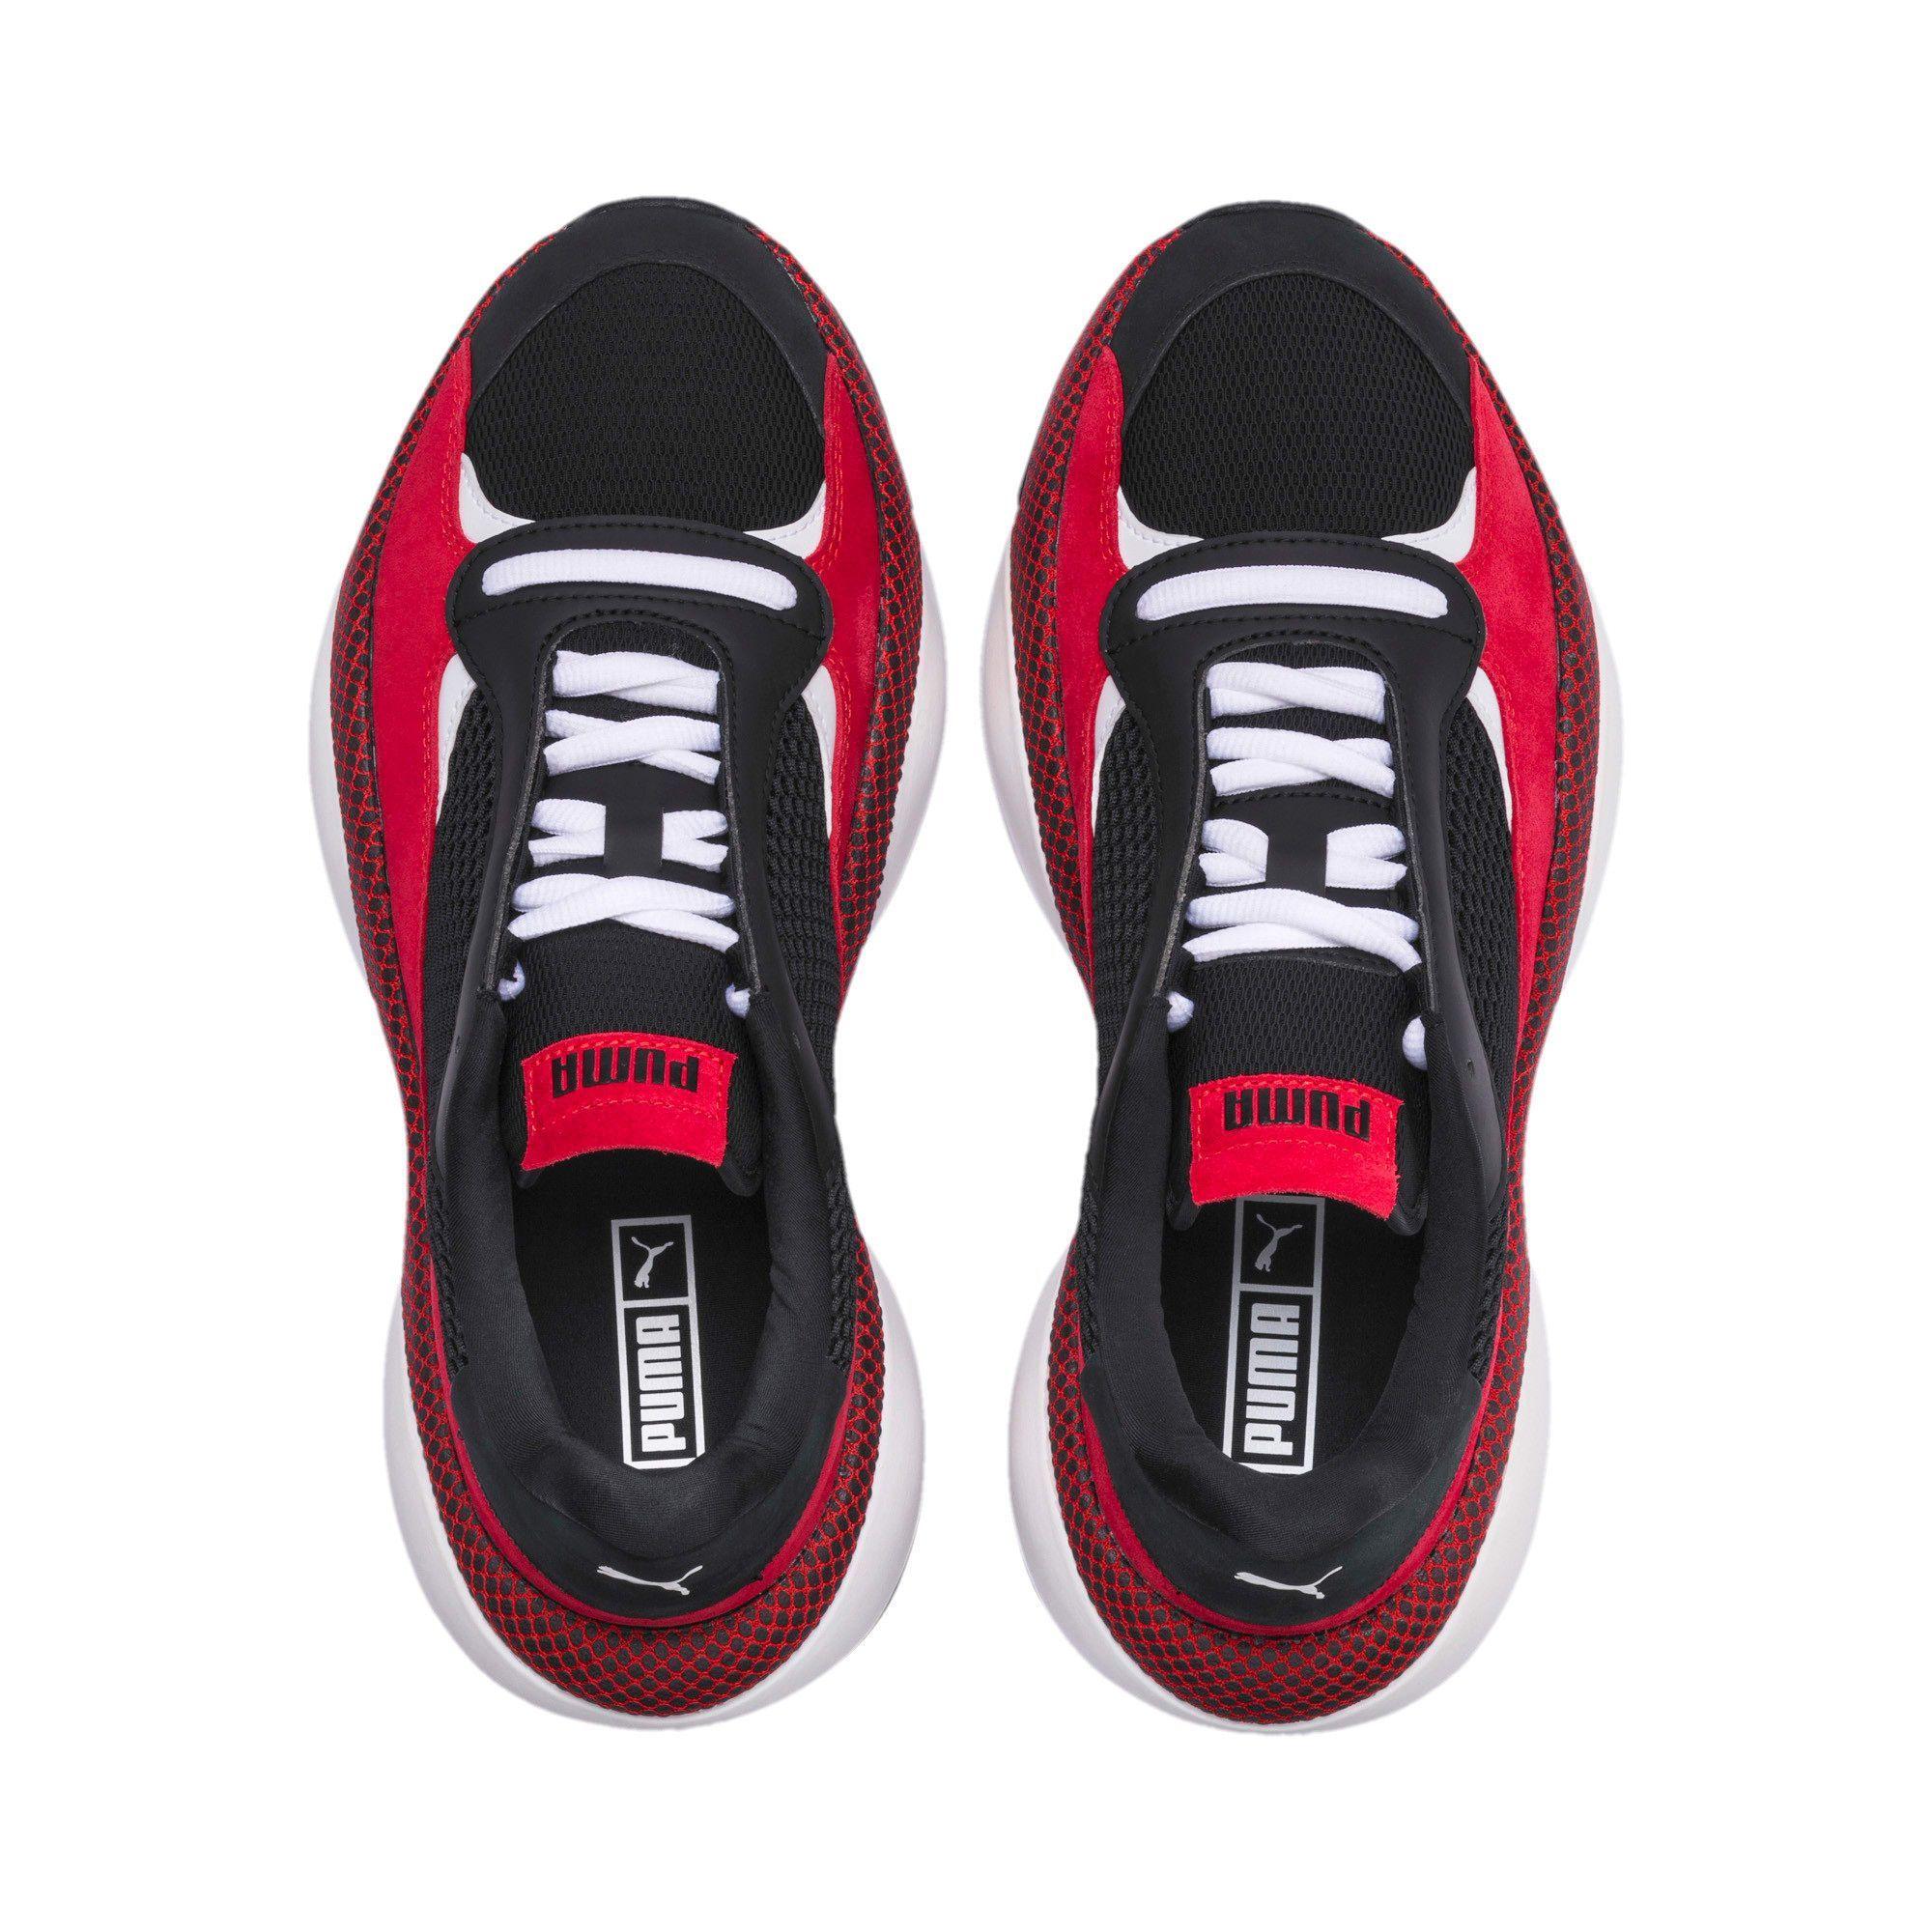 Anderung Blitz Sneakers Puma Schwarz Hochrisikorot Puma Anderungssammlung Puma Grossbritannien Anderung Anderungssammlung Blit In 2020 Sneakers Black Shoes Puma